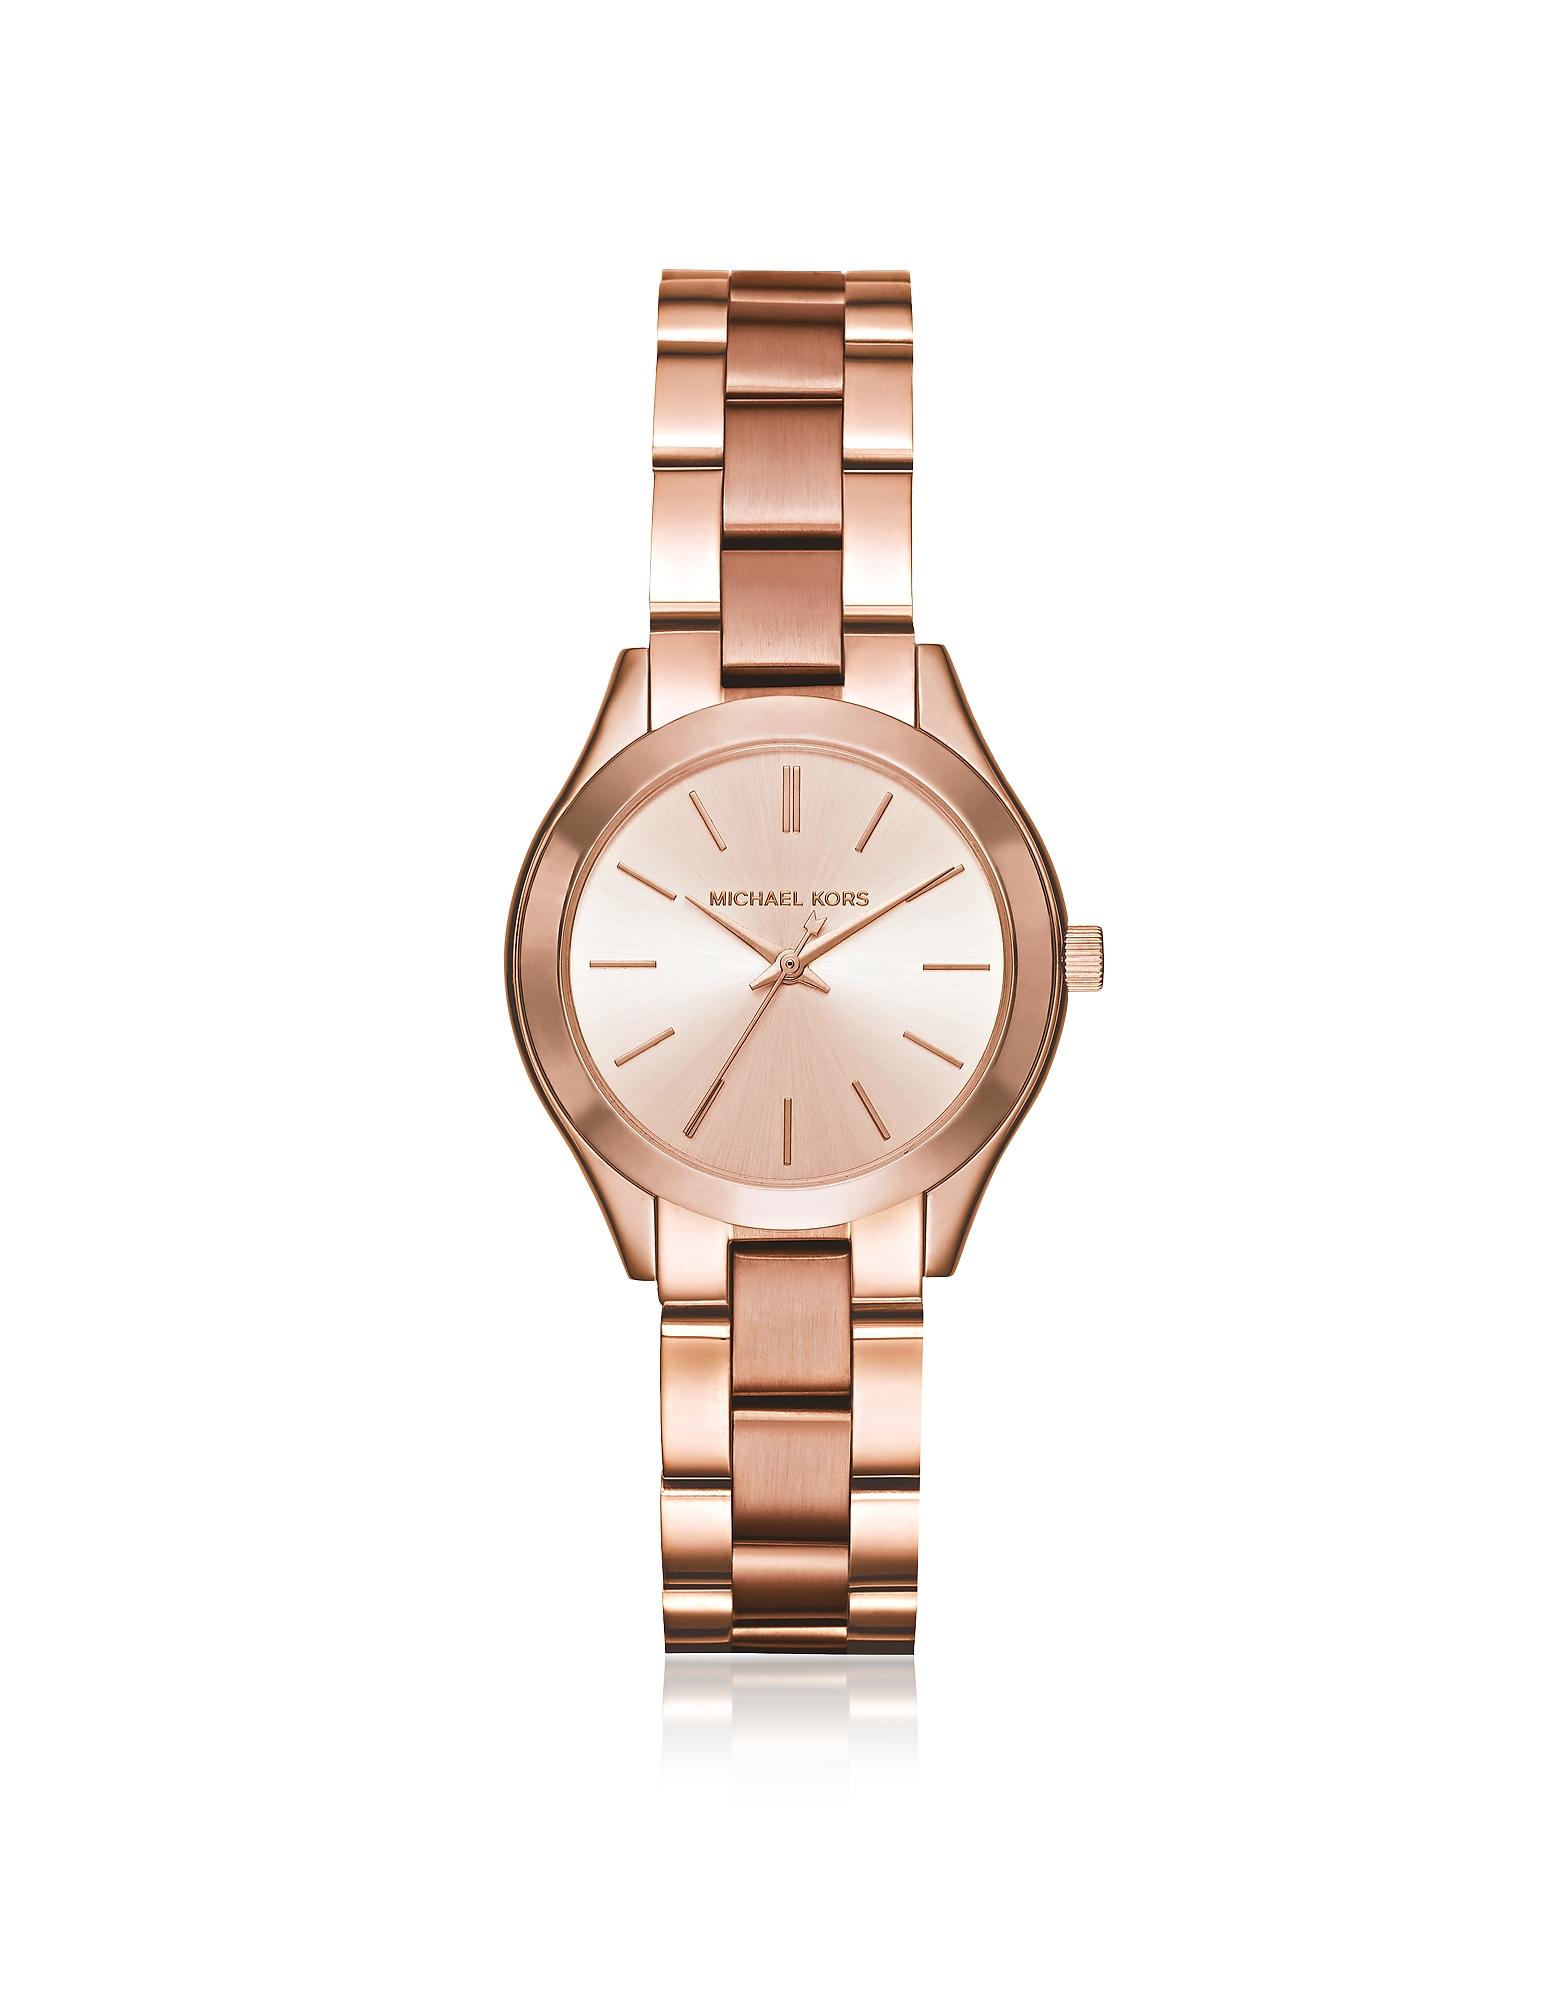 Женские Часы Оттенка Розового Золота Mini Slim Runway Michael Kors